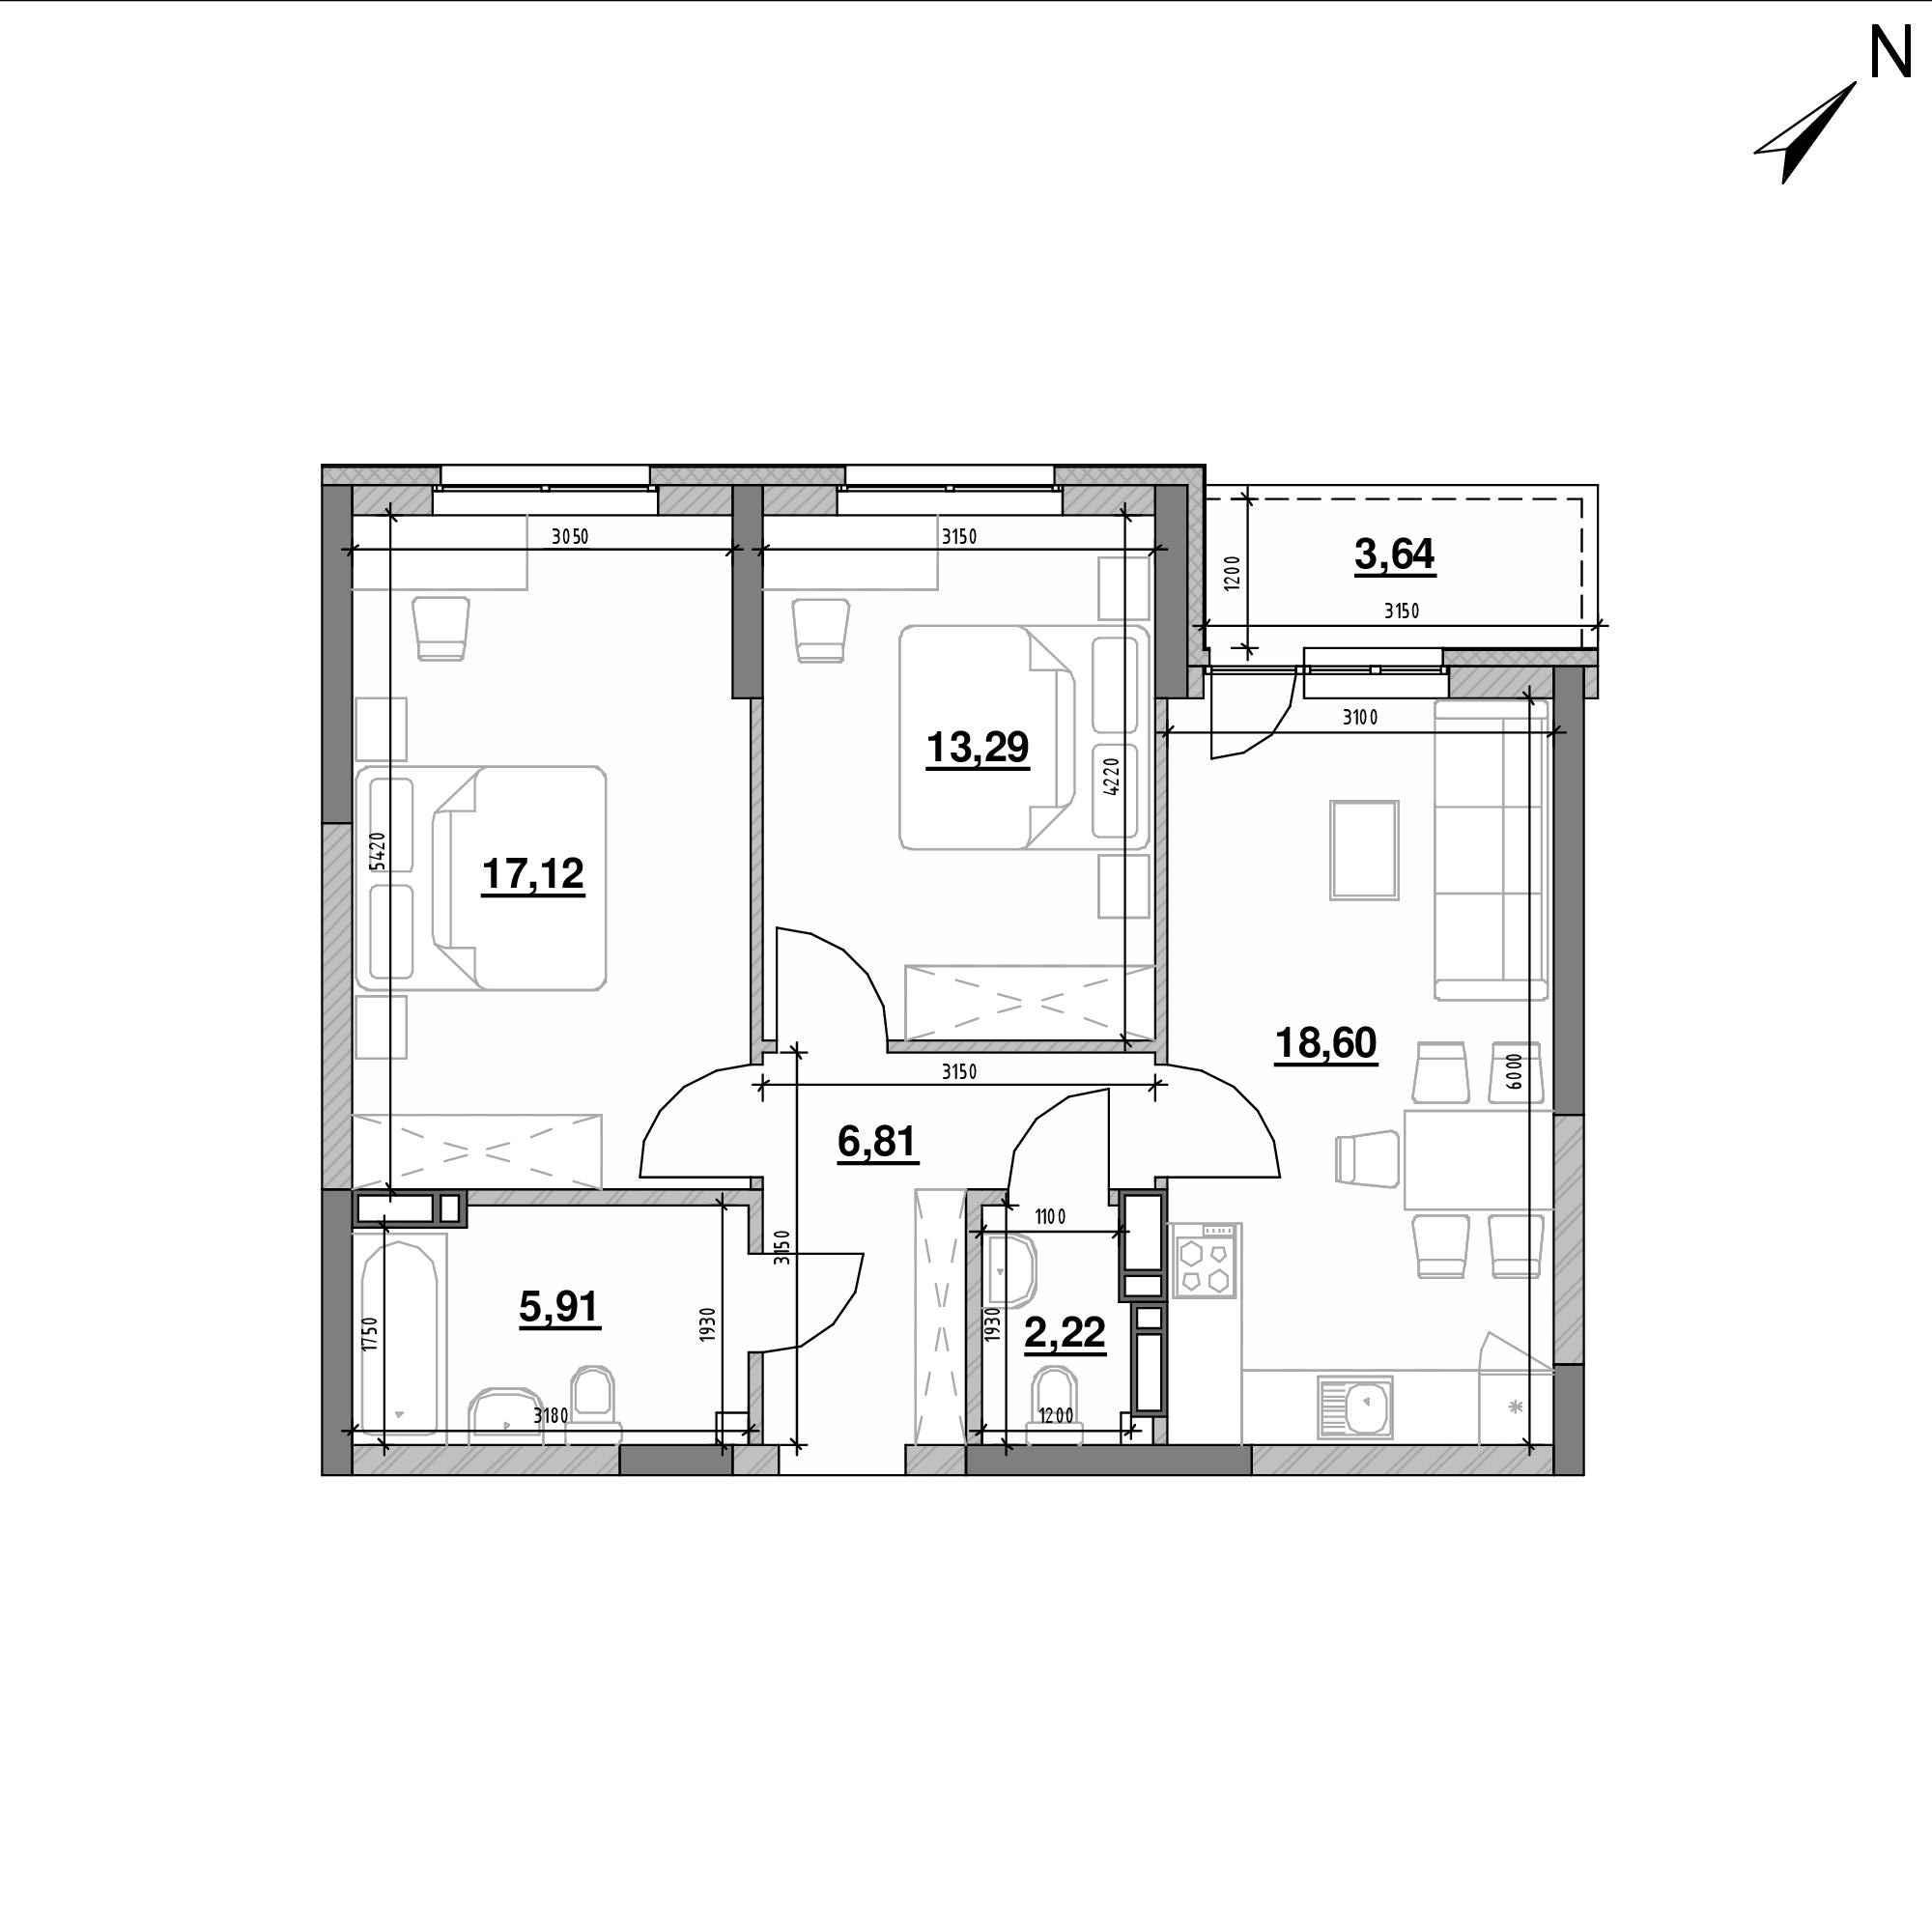 ЖК Оk'Land: планування 2-кімнатної квартири, №466, 67.59 м<sup>2</sup>